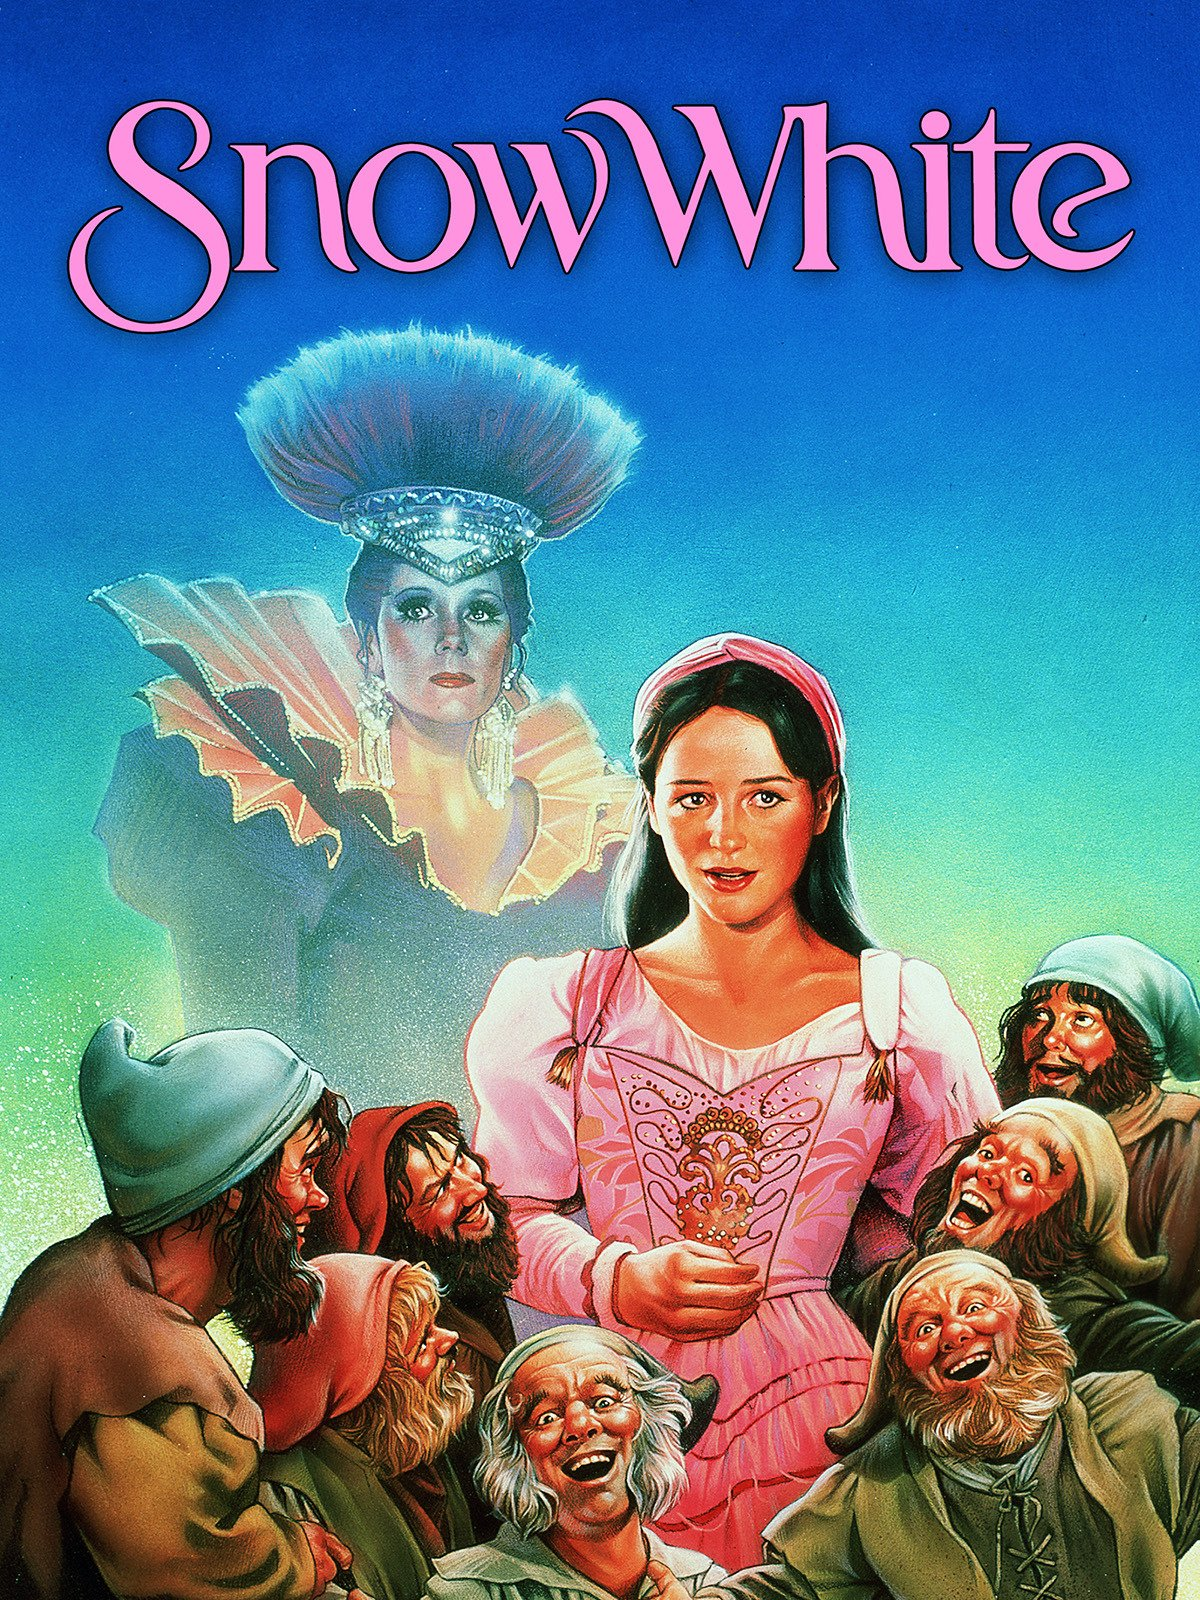 sky movies disney snow white and the seven dwarfs